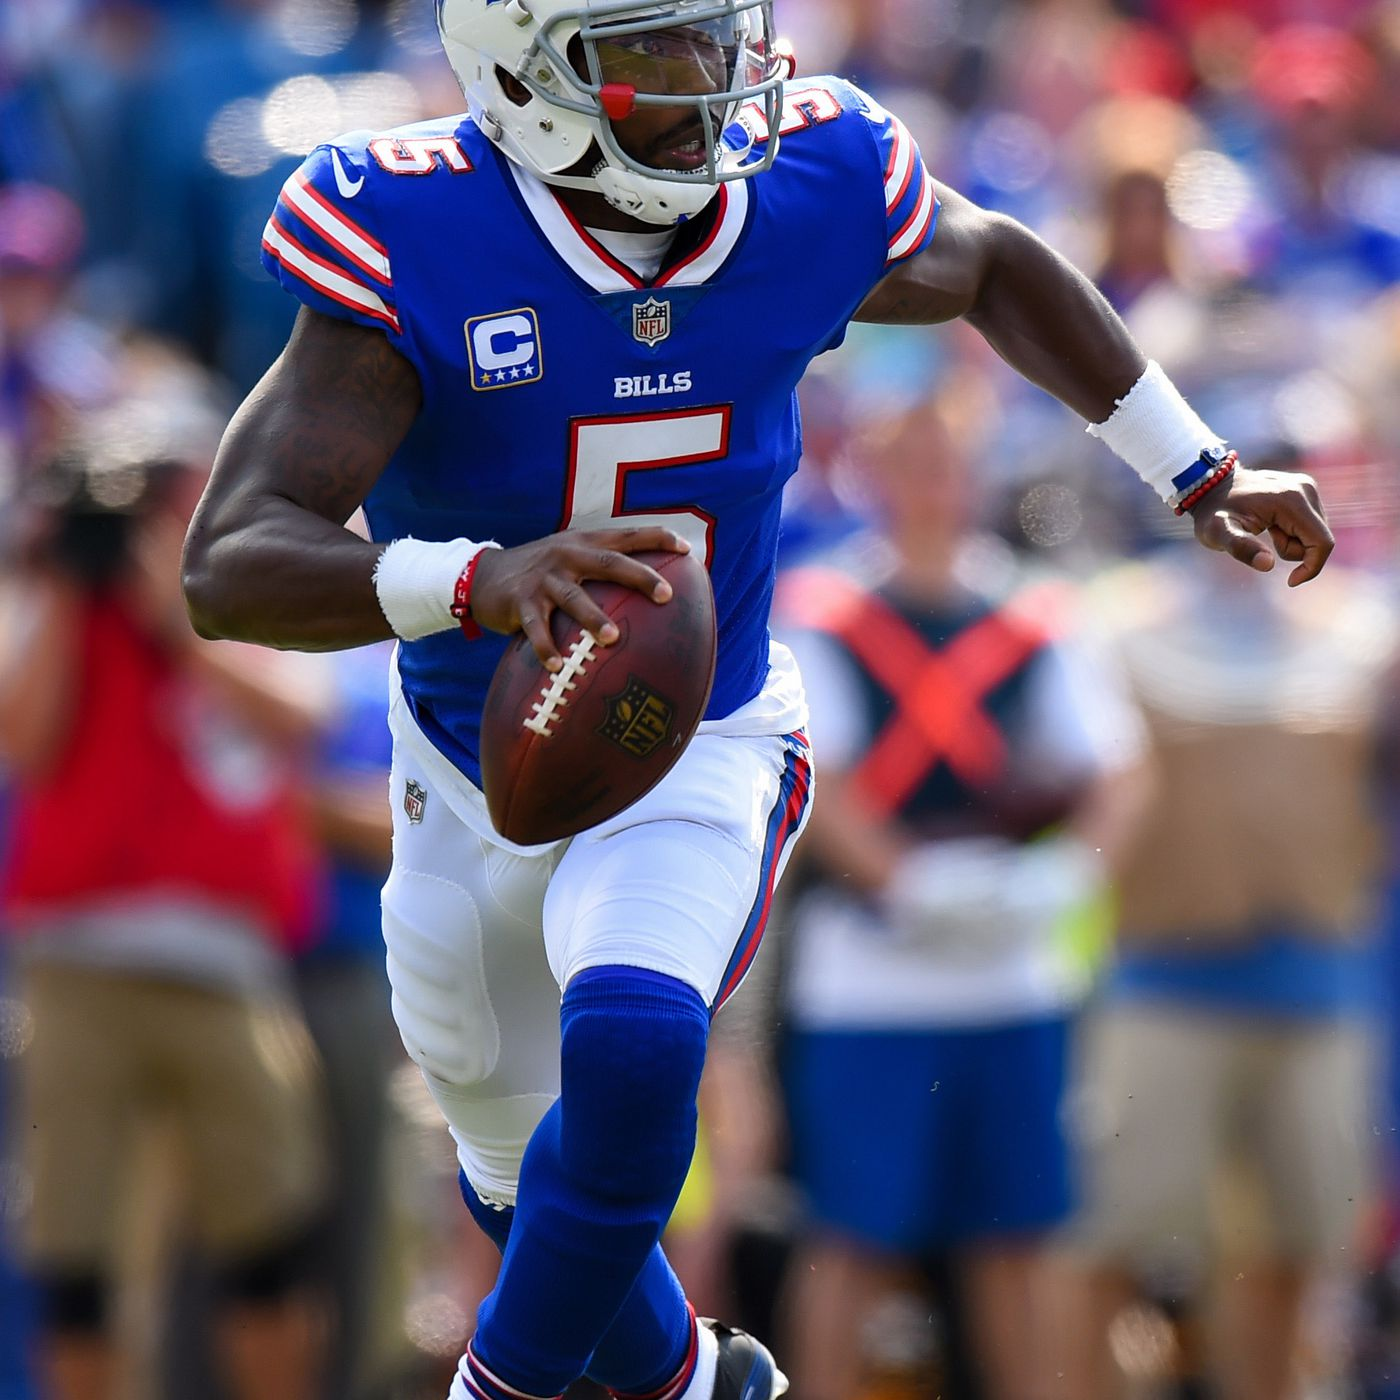 62b04c3148f Tyrod Taylor now has more rushing yards than any Buffalo Bills quarterback  - Buffalo Rumblings